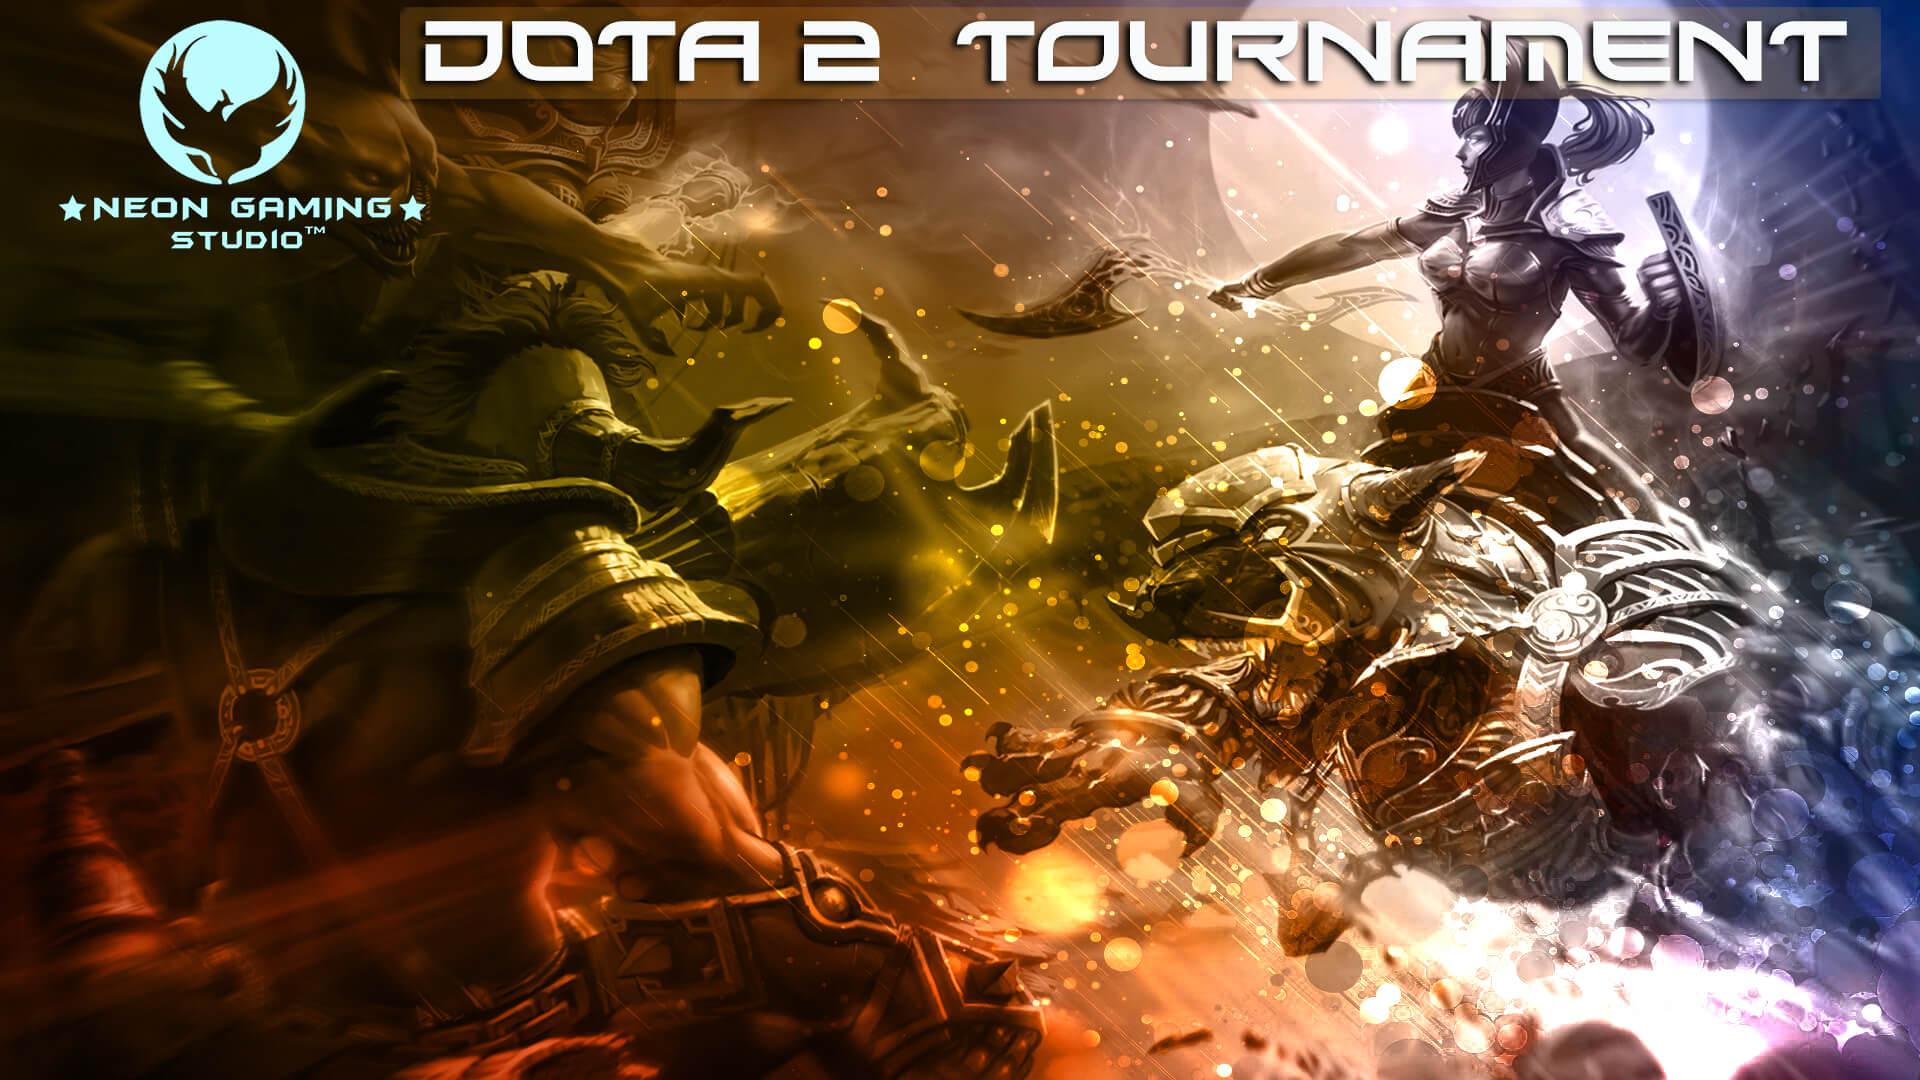 NGS DOTA 2 5v5 Tournament Season 3